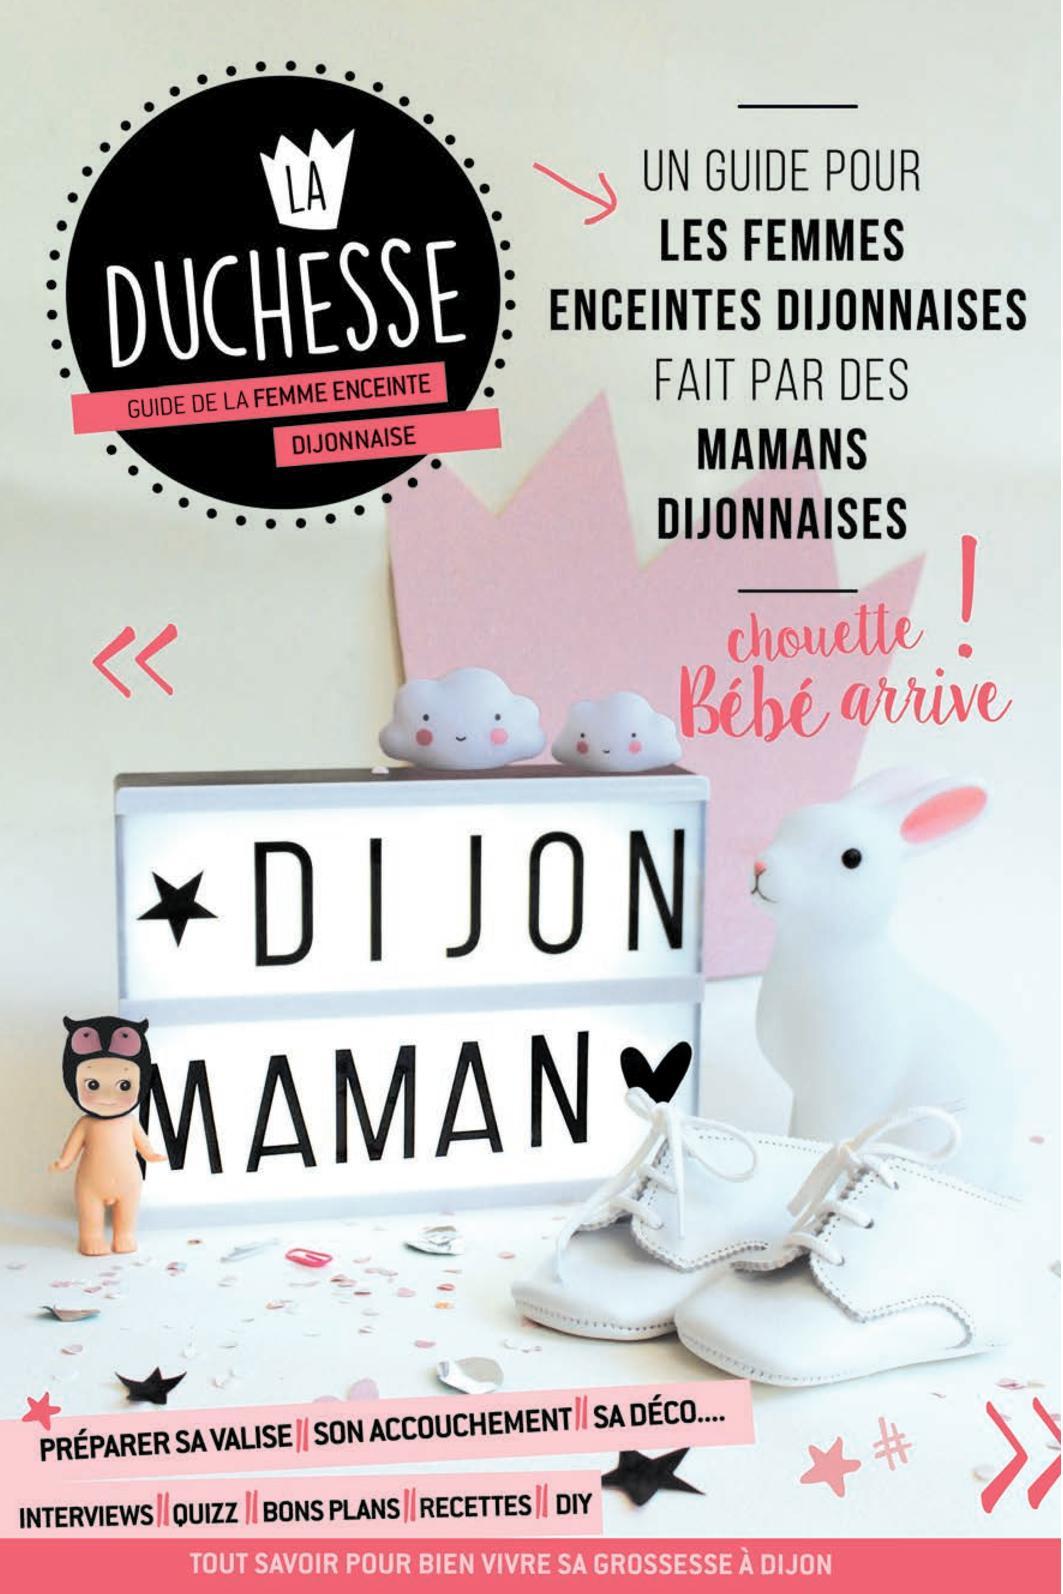 21a998ff43a Calaméo - La Duchesse Guide Futur Maman 2018